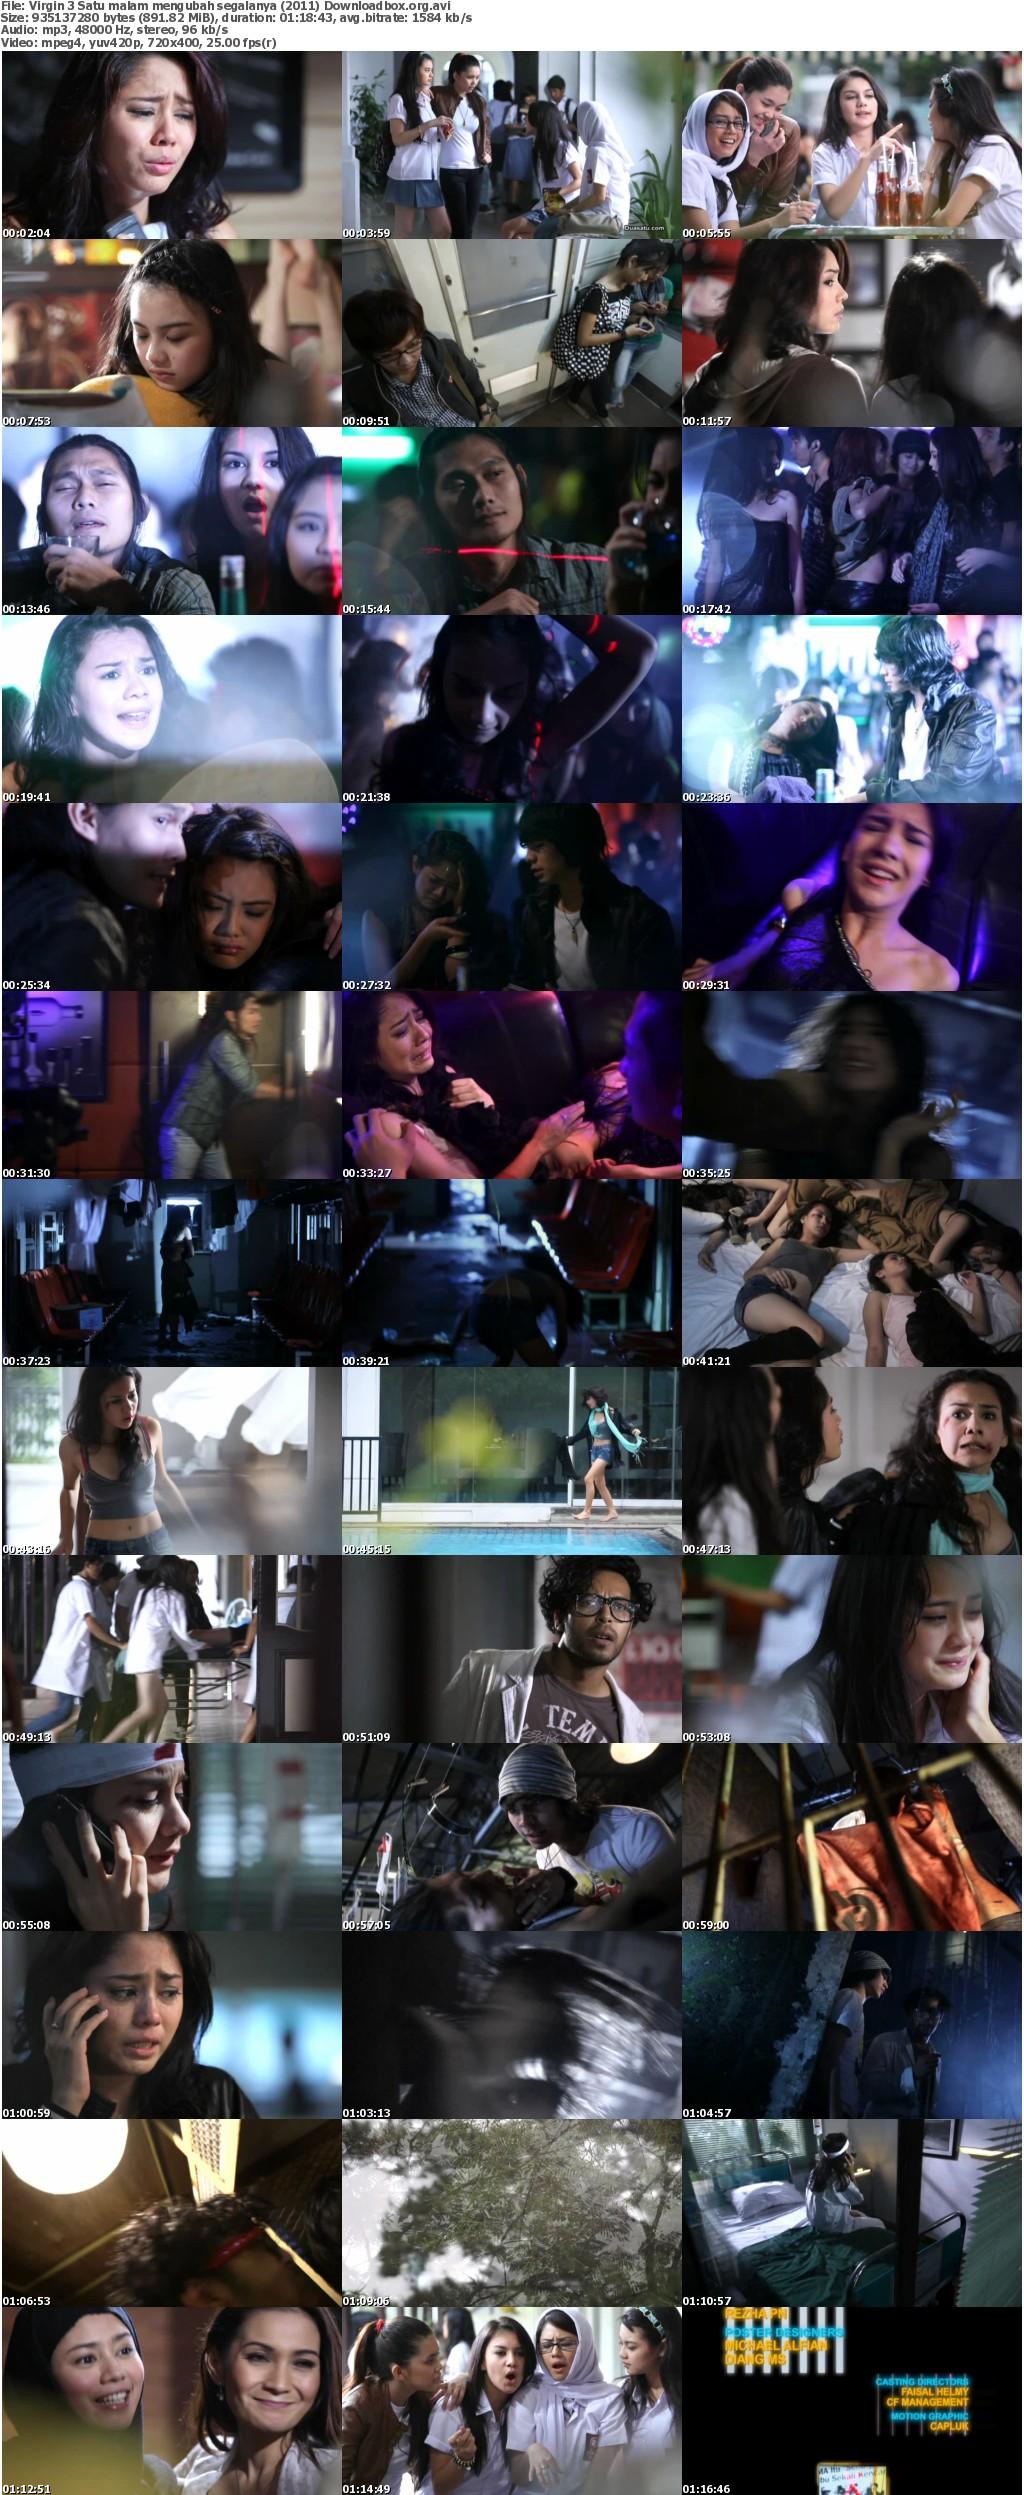 Virgin 3: Satu malam mengubah segalanya (2011) DVDRip